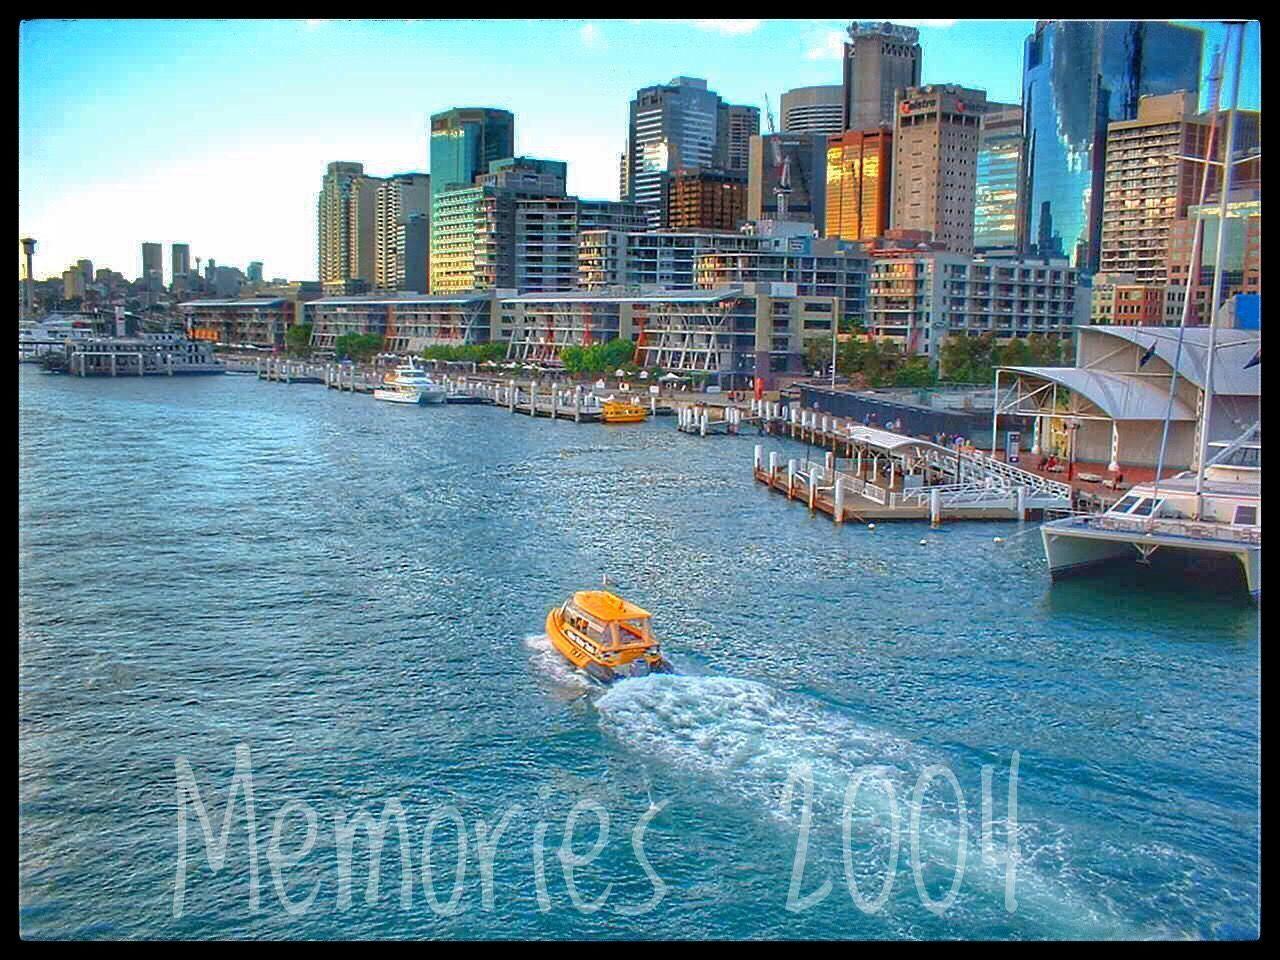 225/365 Sydney Harbour in HDR HDR Photooftheday Photo365 Bilsbekblog Sorcerer86 EyeEmAustralia Eyeemsydney Fujiography FujiFinePixA101 Memories 2004